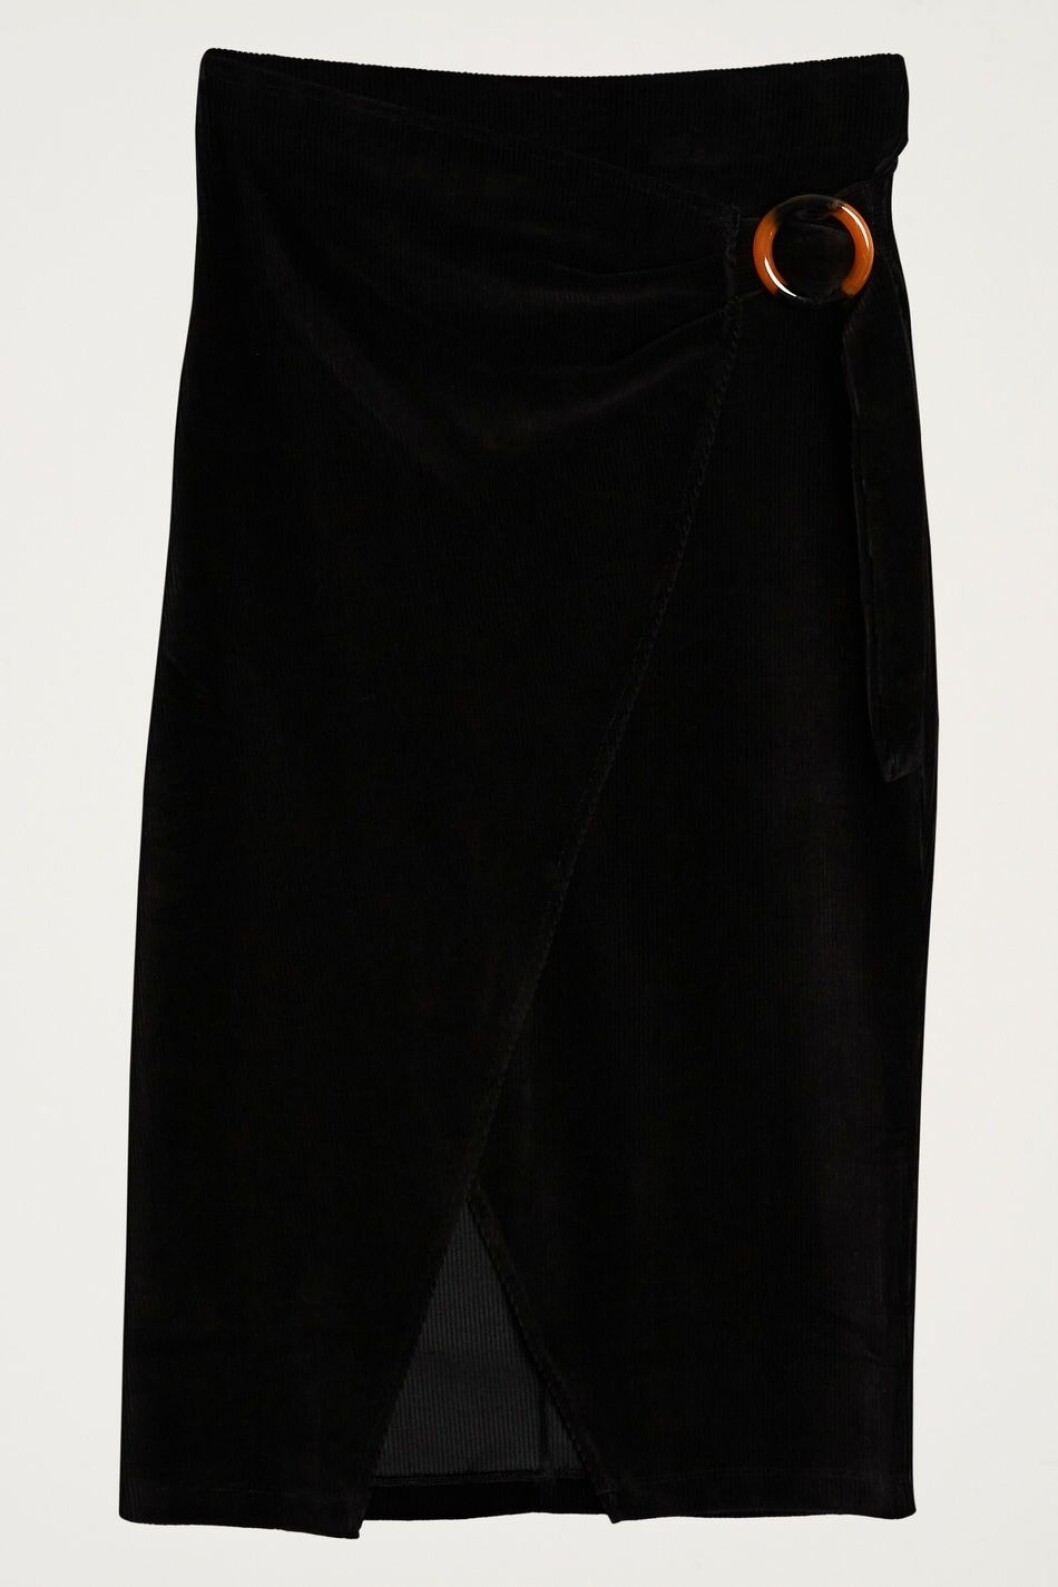 Svart kjol i manchester